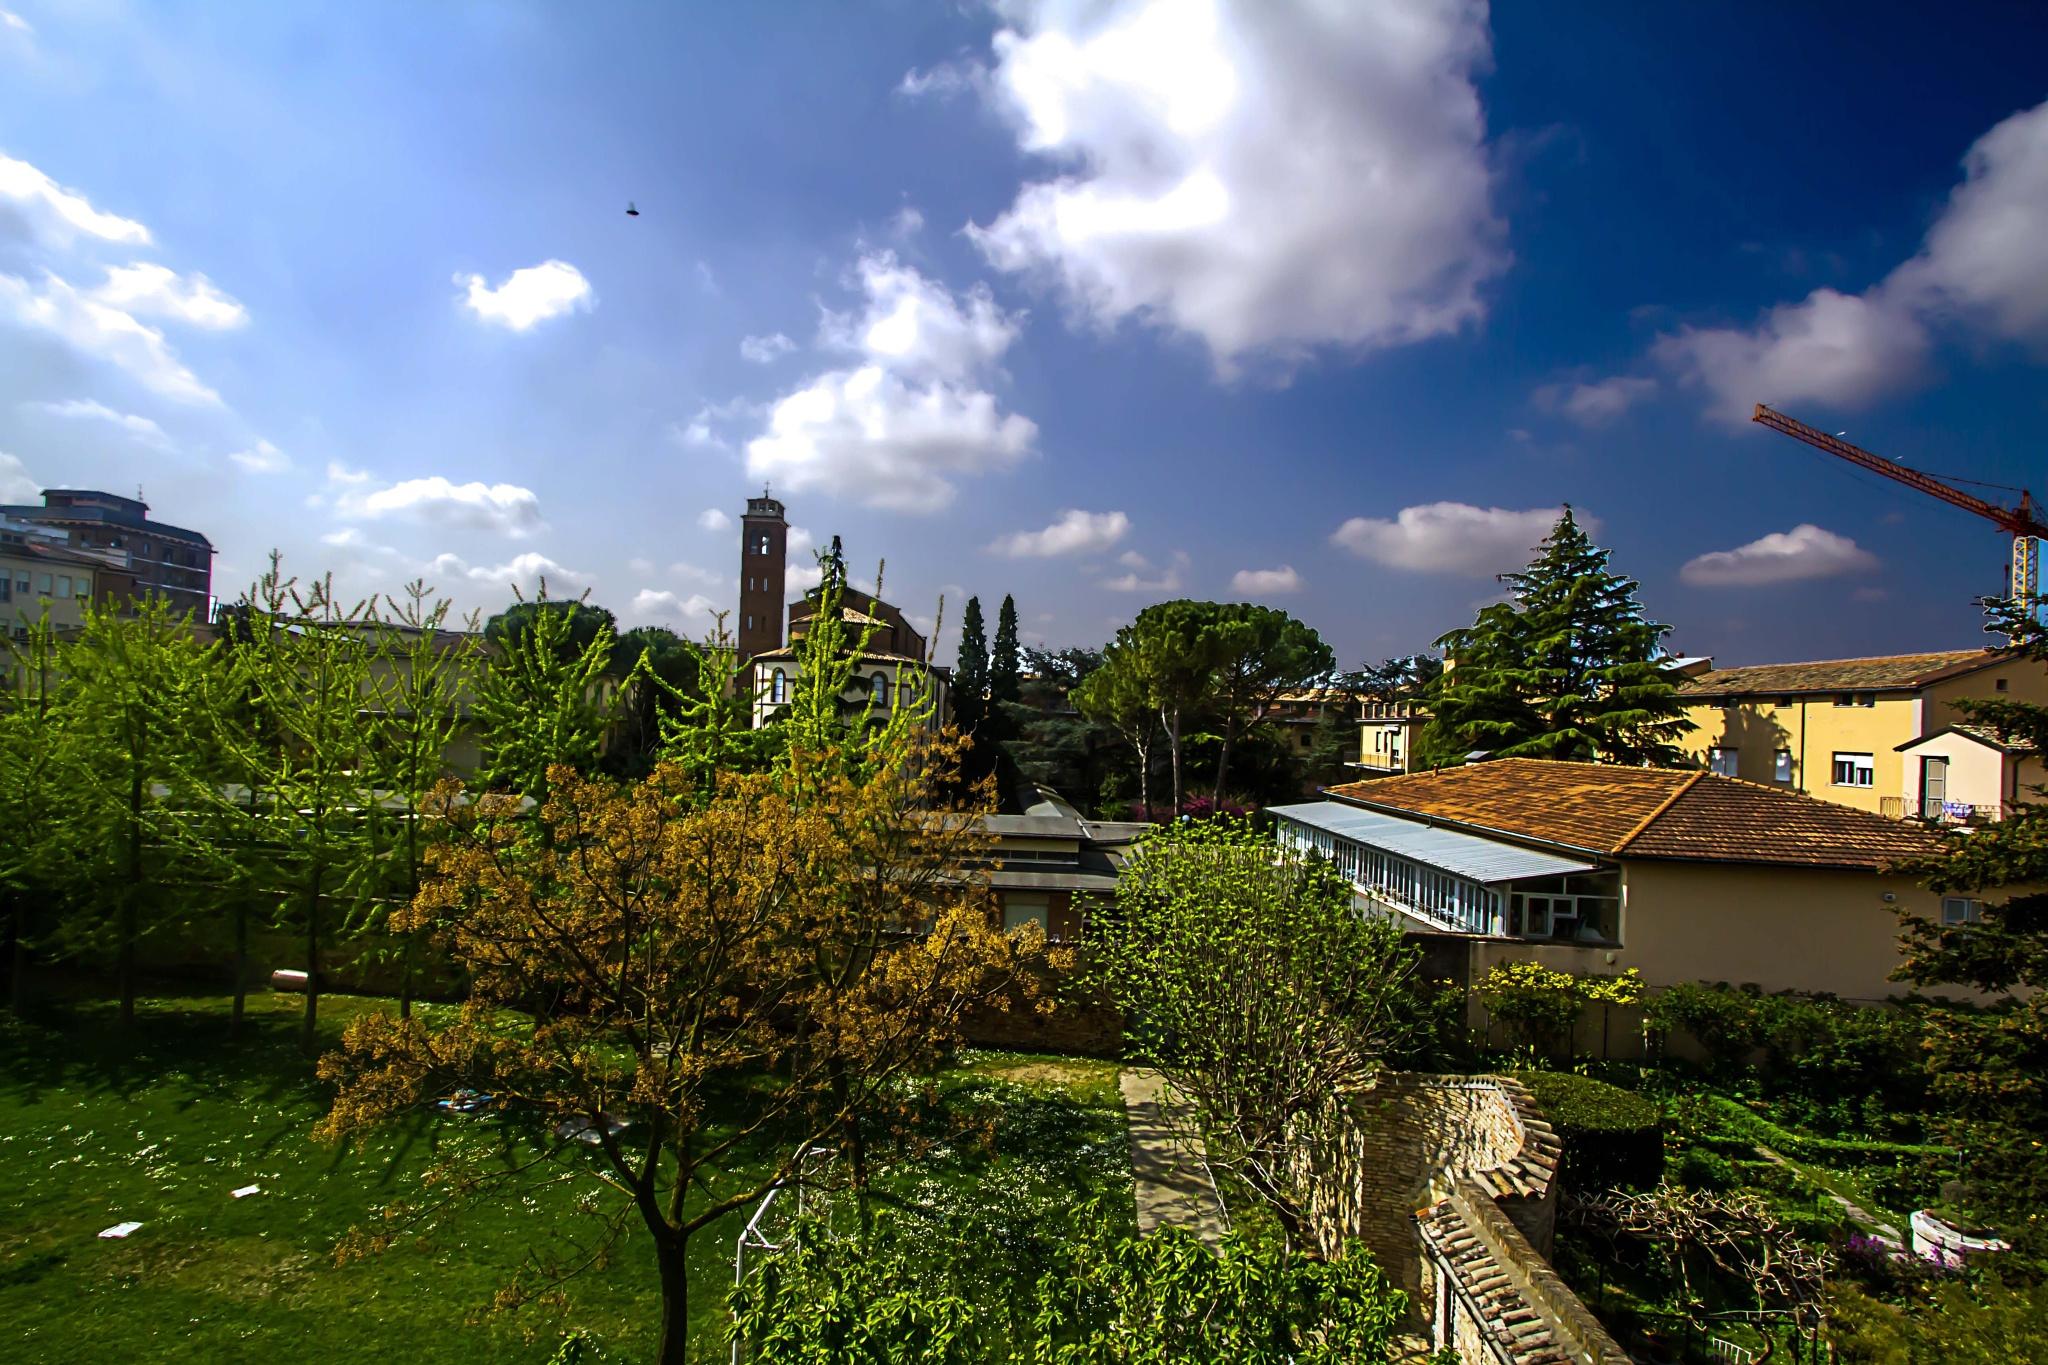 Ravenna by Maurizio